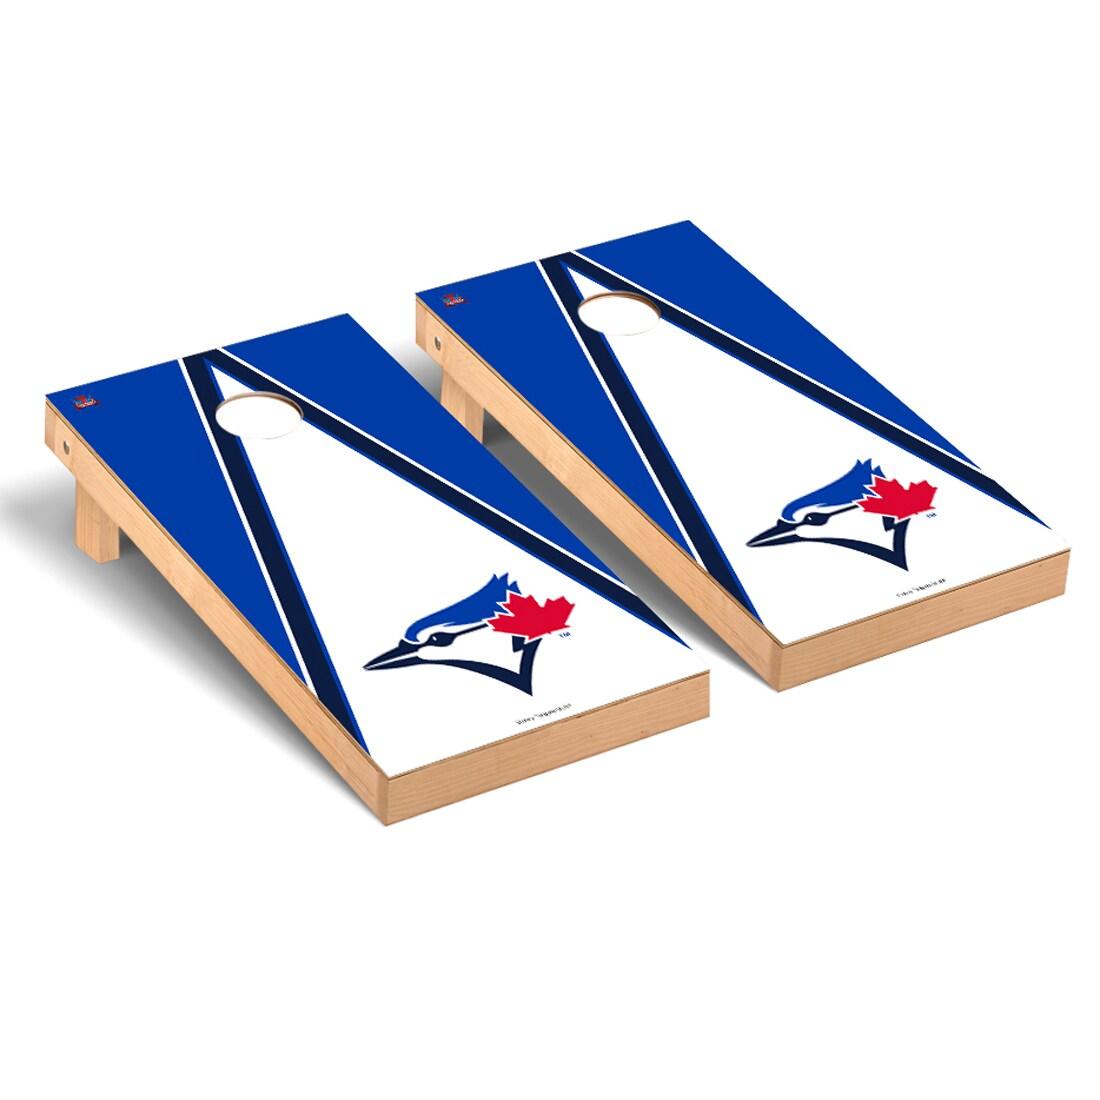 Toronto Blue Jays 2' x 4' Triangle Cornhole Board Tailgate Toss Set